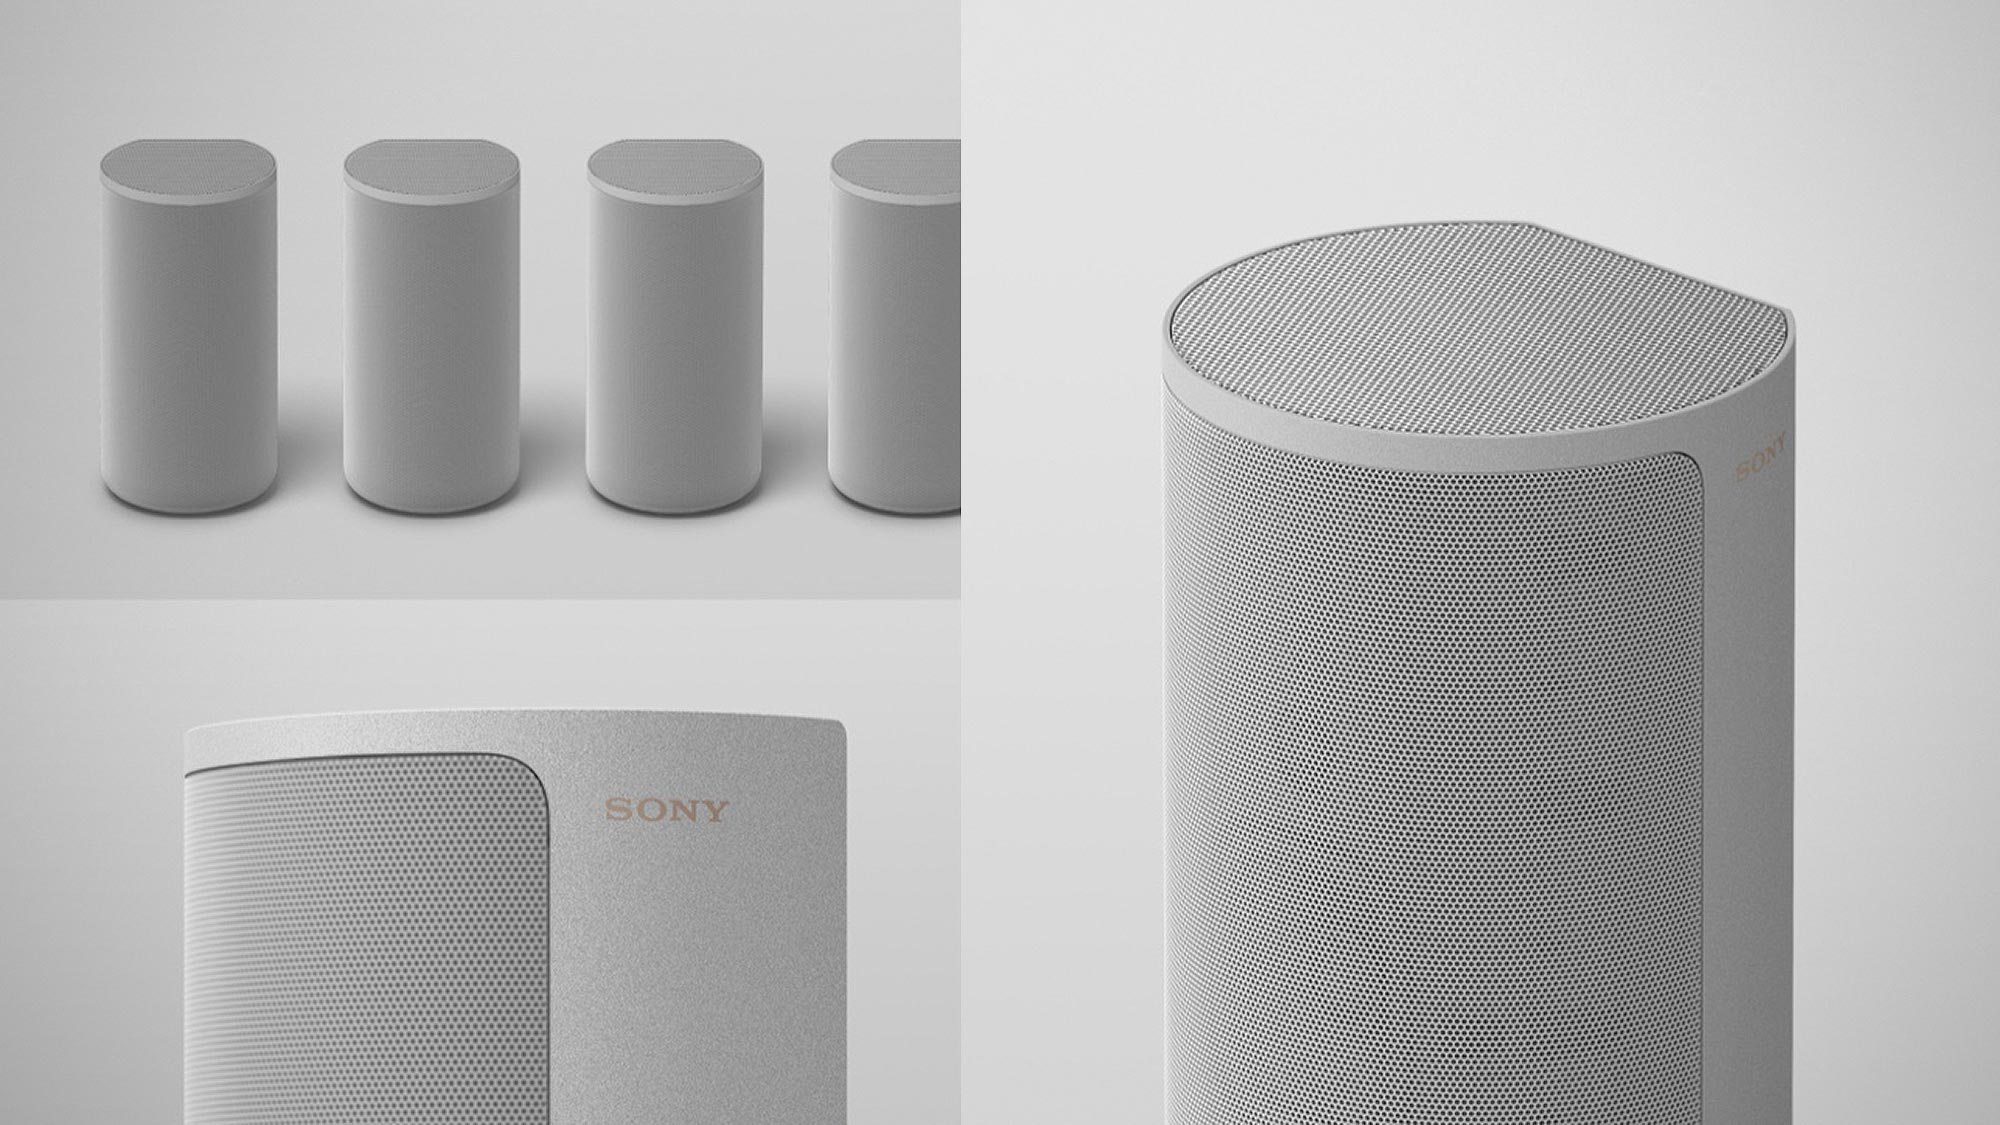 Sony HT-A9 HTS and HT-A7000 Soundbar